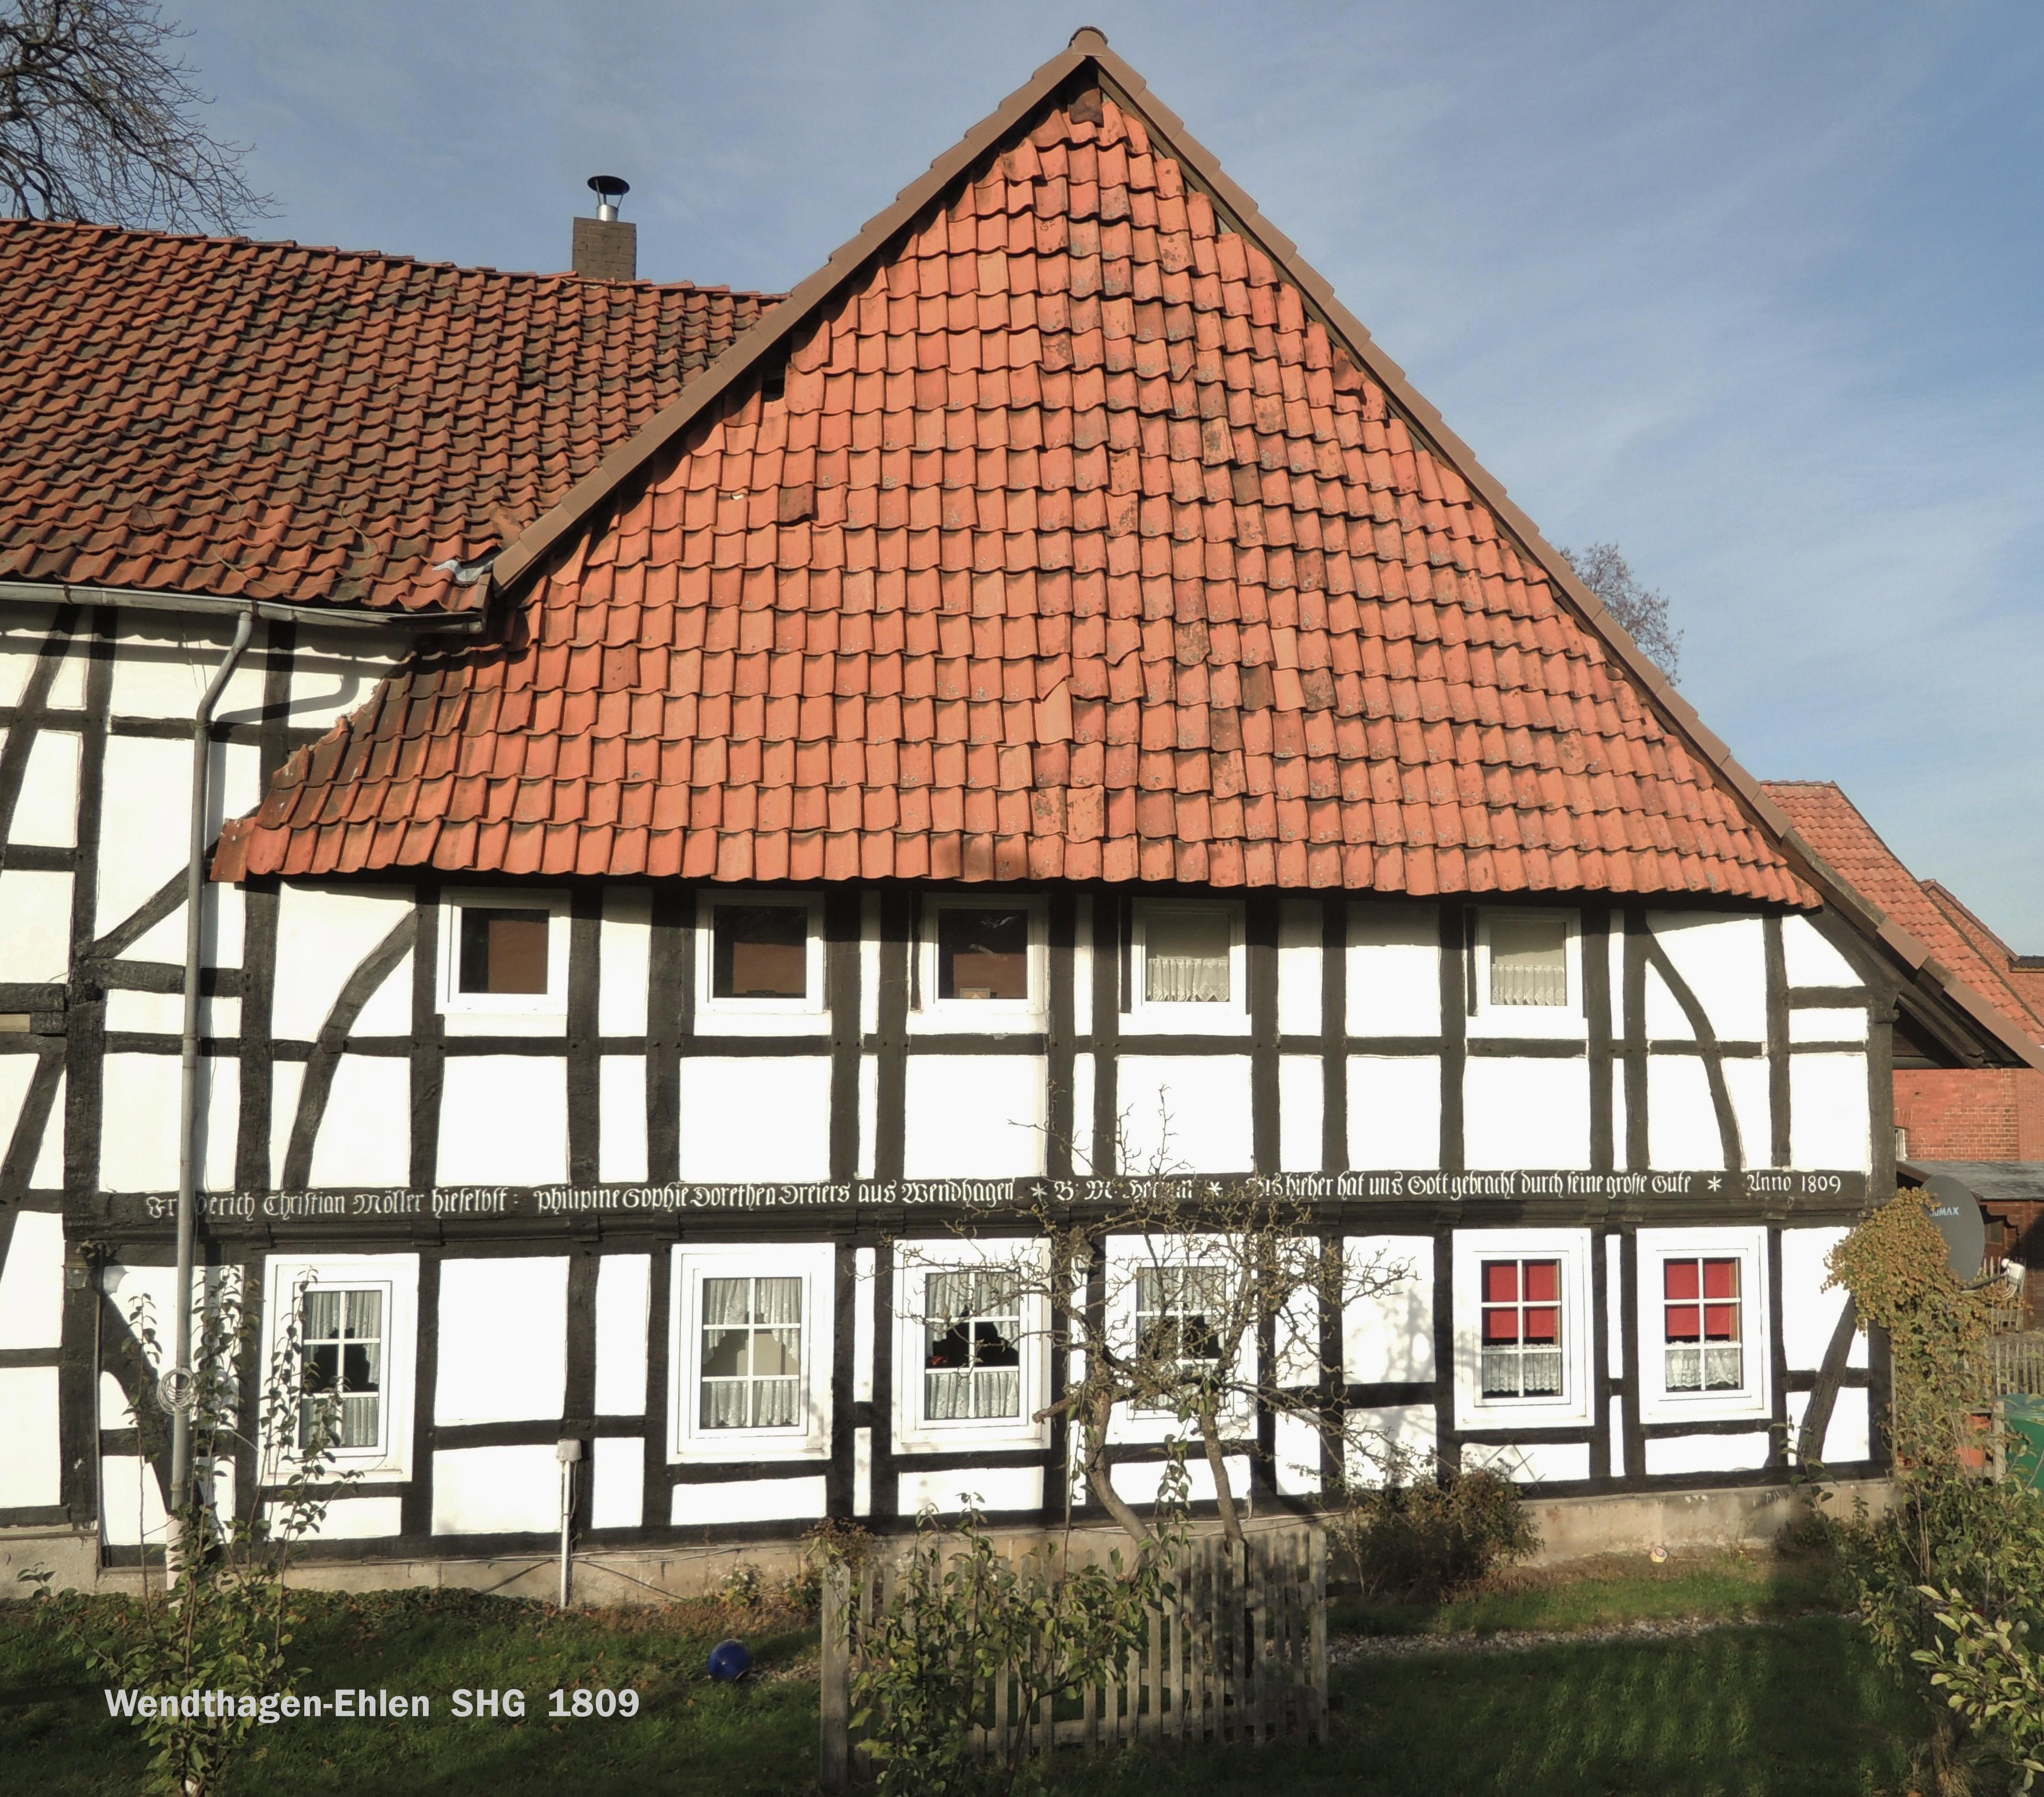 r-wendthagen-ehlen-shg-1809